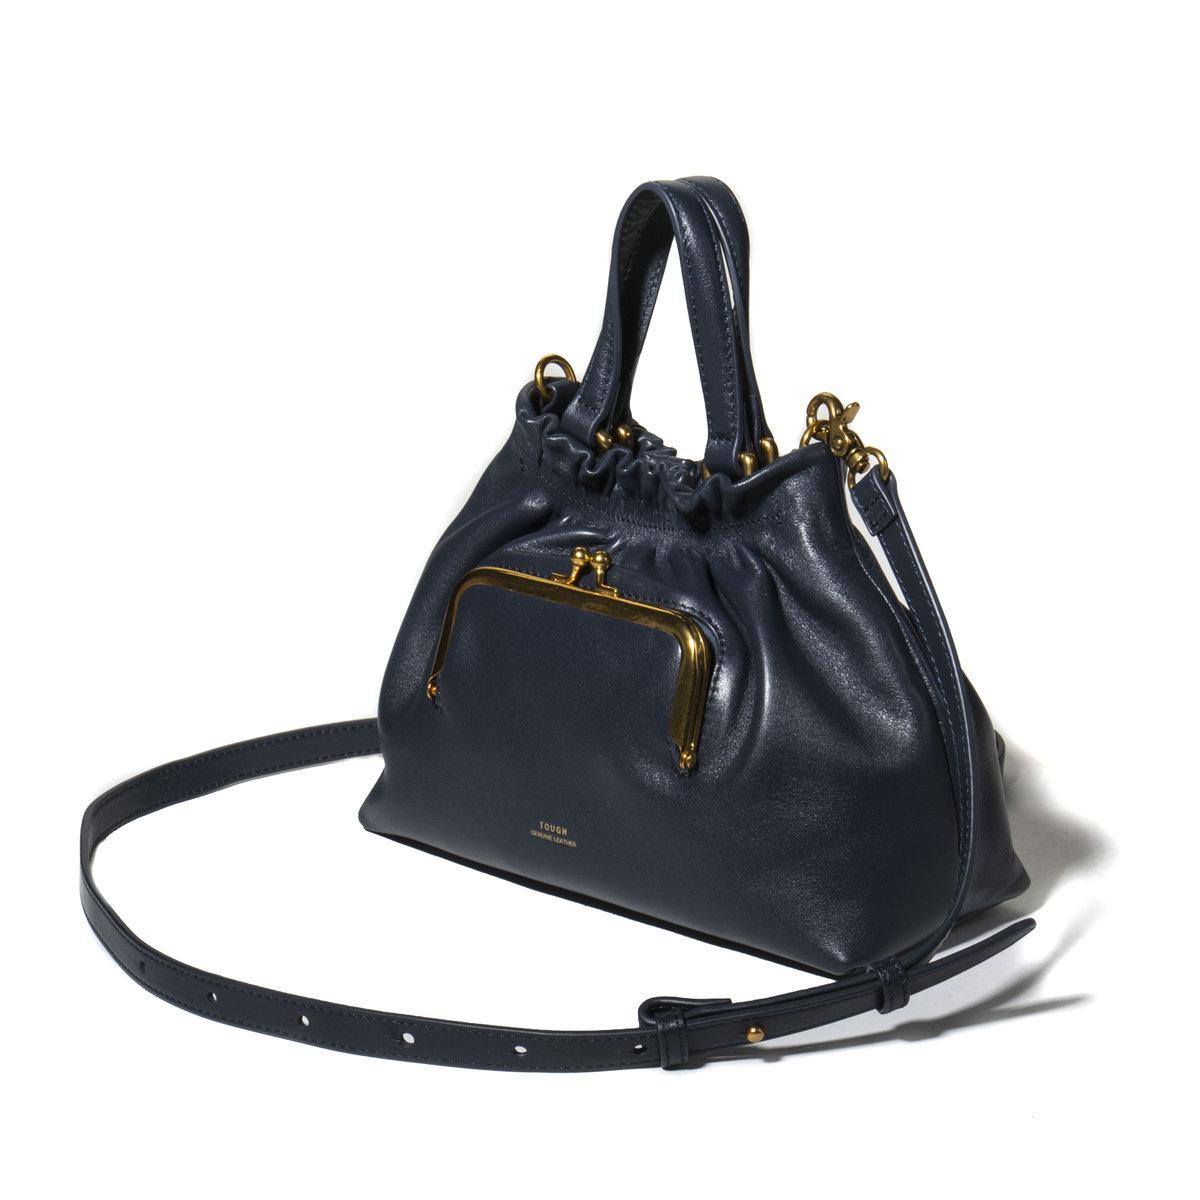 TOUGH Jeansmith   TOUGH Jeansmith Leather Bag   HKTVmall Online Shopping 5d89a5b4e8